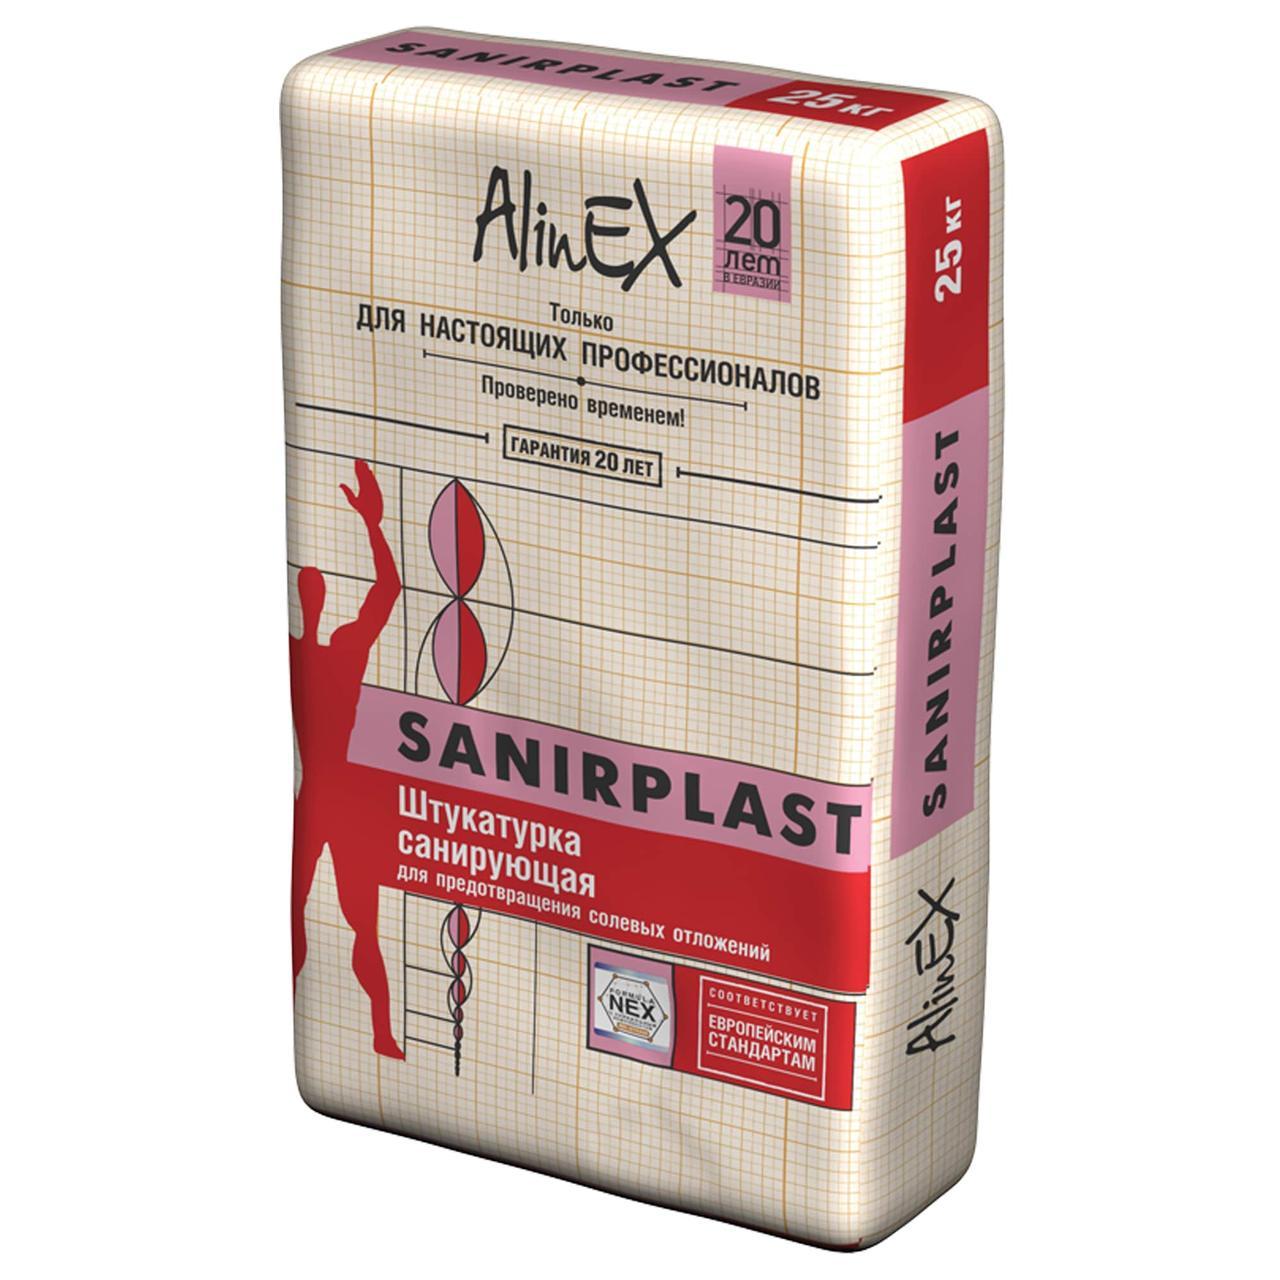 Штукатурка санирующая AlinEx Sanirplast